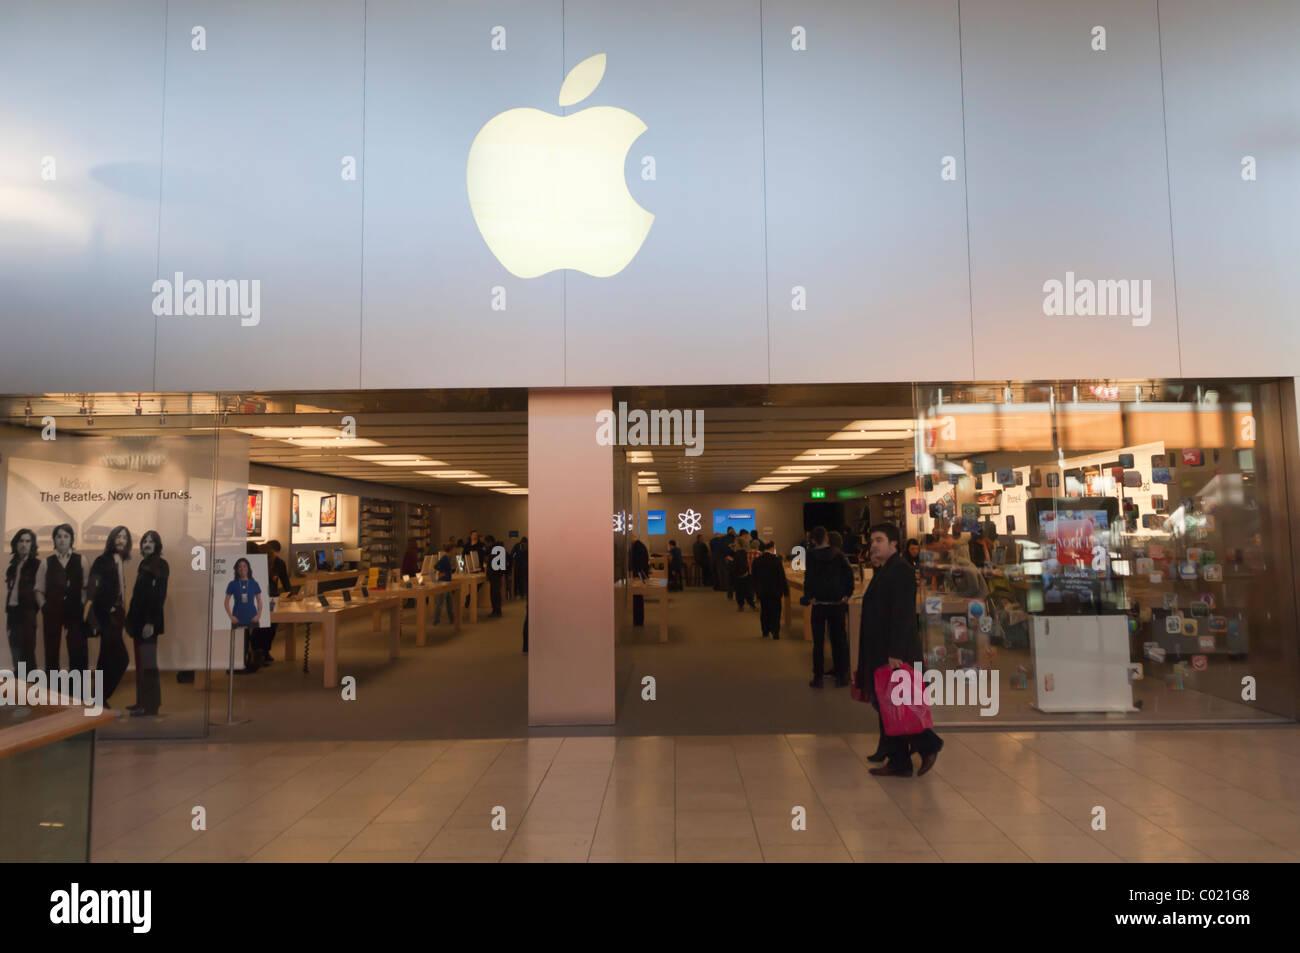 Apple Shop Stock Photos & Apple Shop Stock Images - Alamy